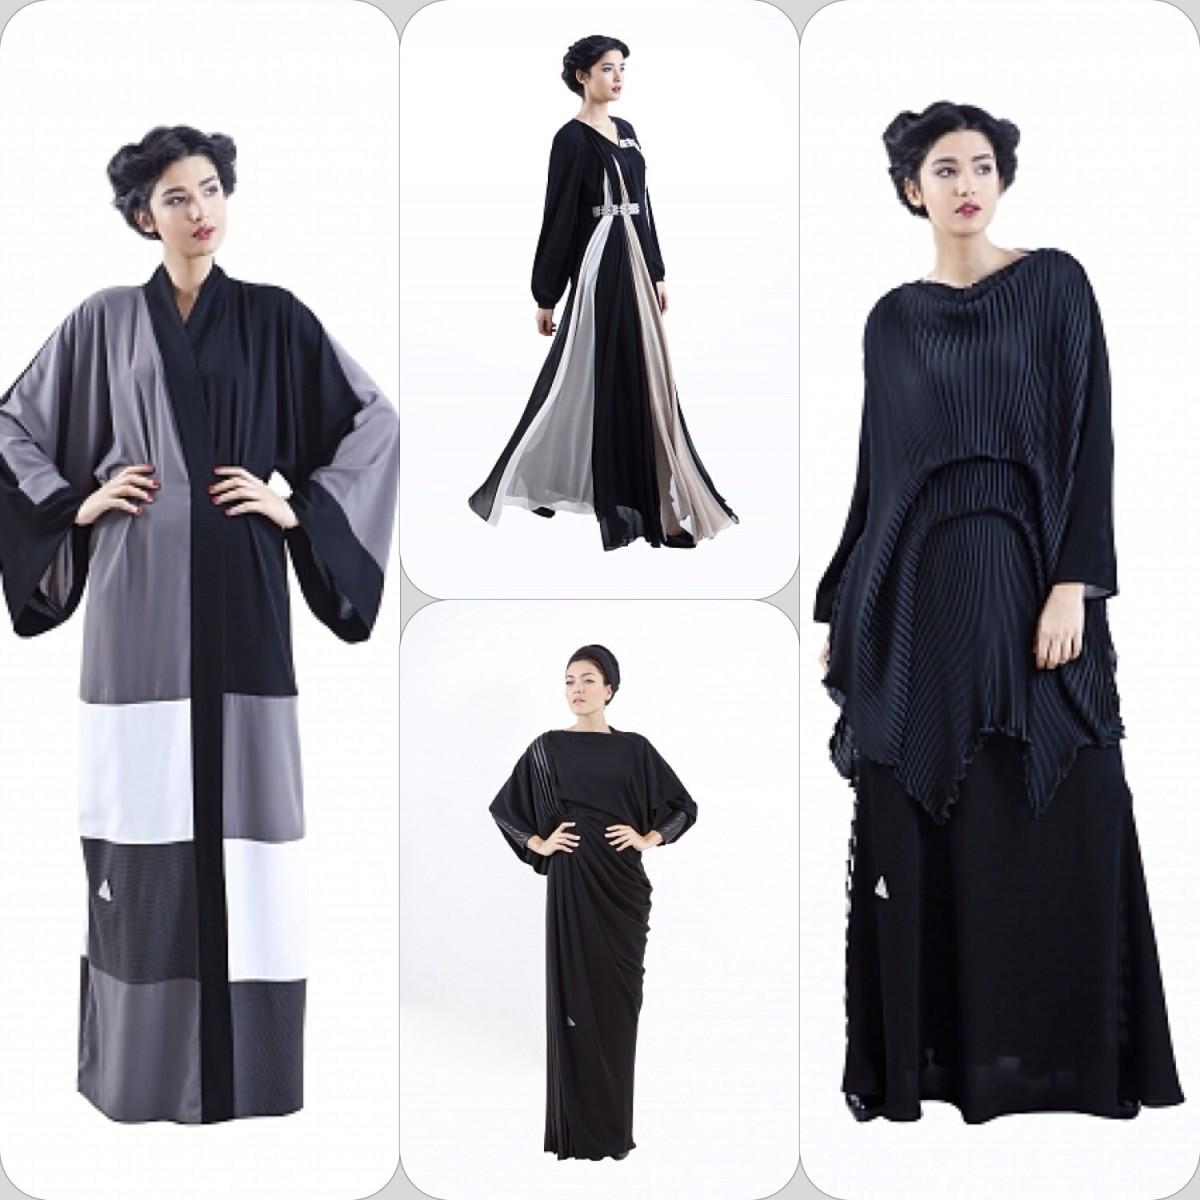 islamic-abaya-fashion-abaya-and-hijab-trendy-styles-photographs-of-beautiful-abayas-and-hijabs